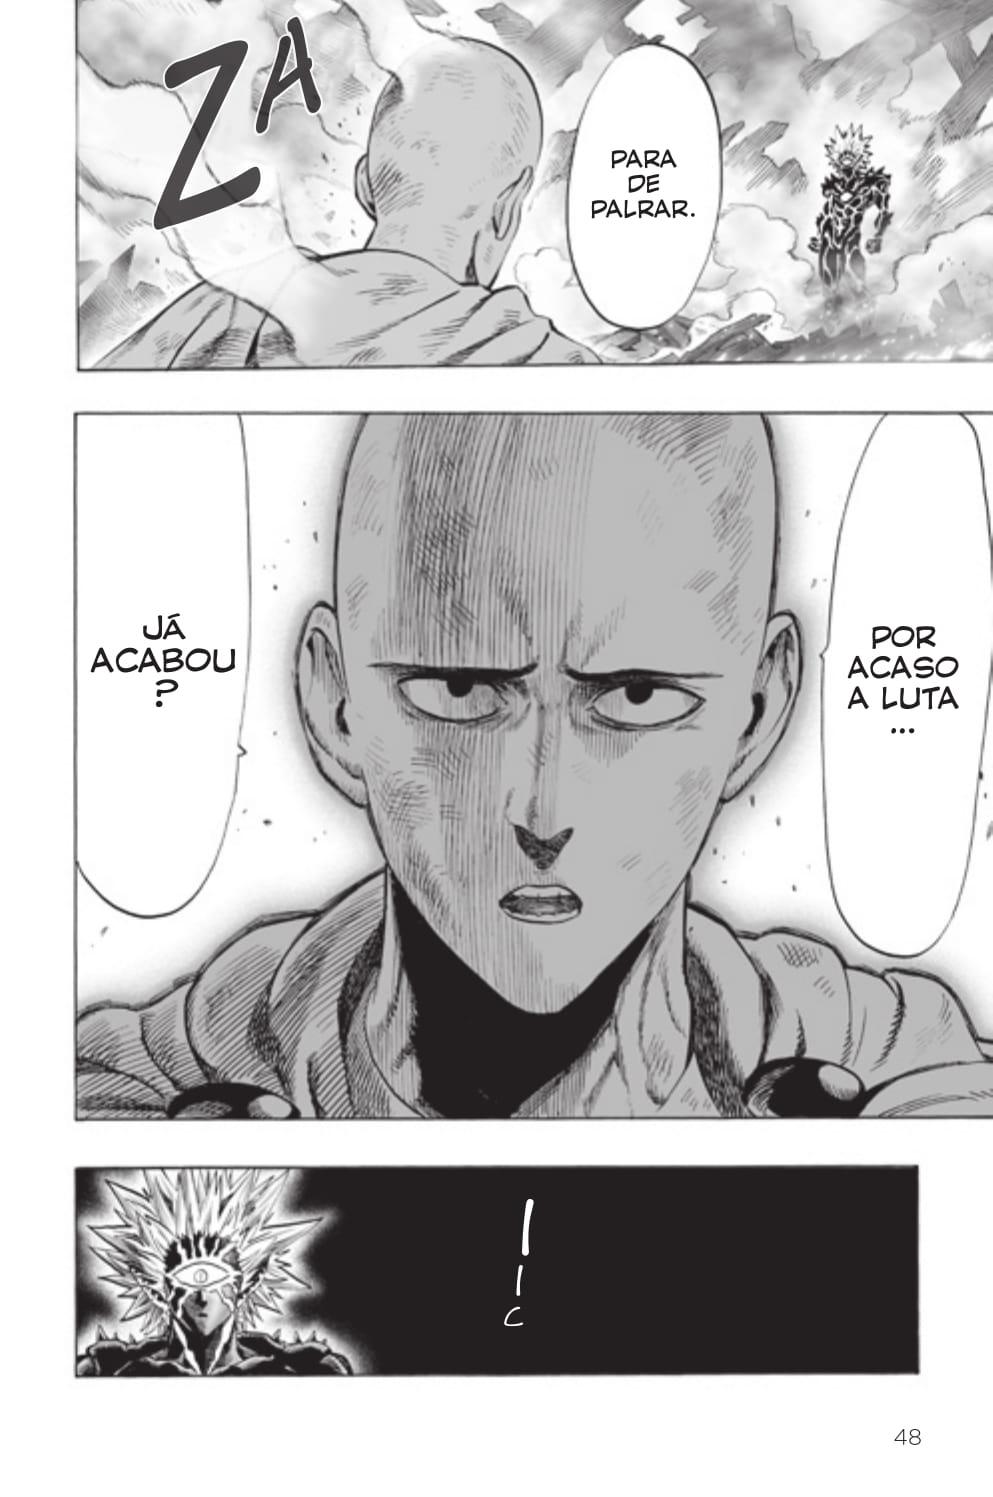 One Punch Man 7, One Punch Man, One, Yusuke Murata, Devir, Deus Me Livro